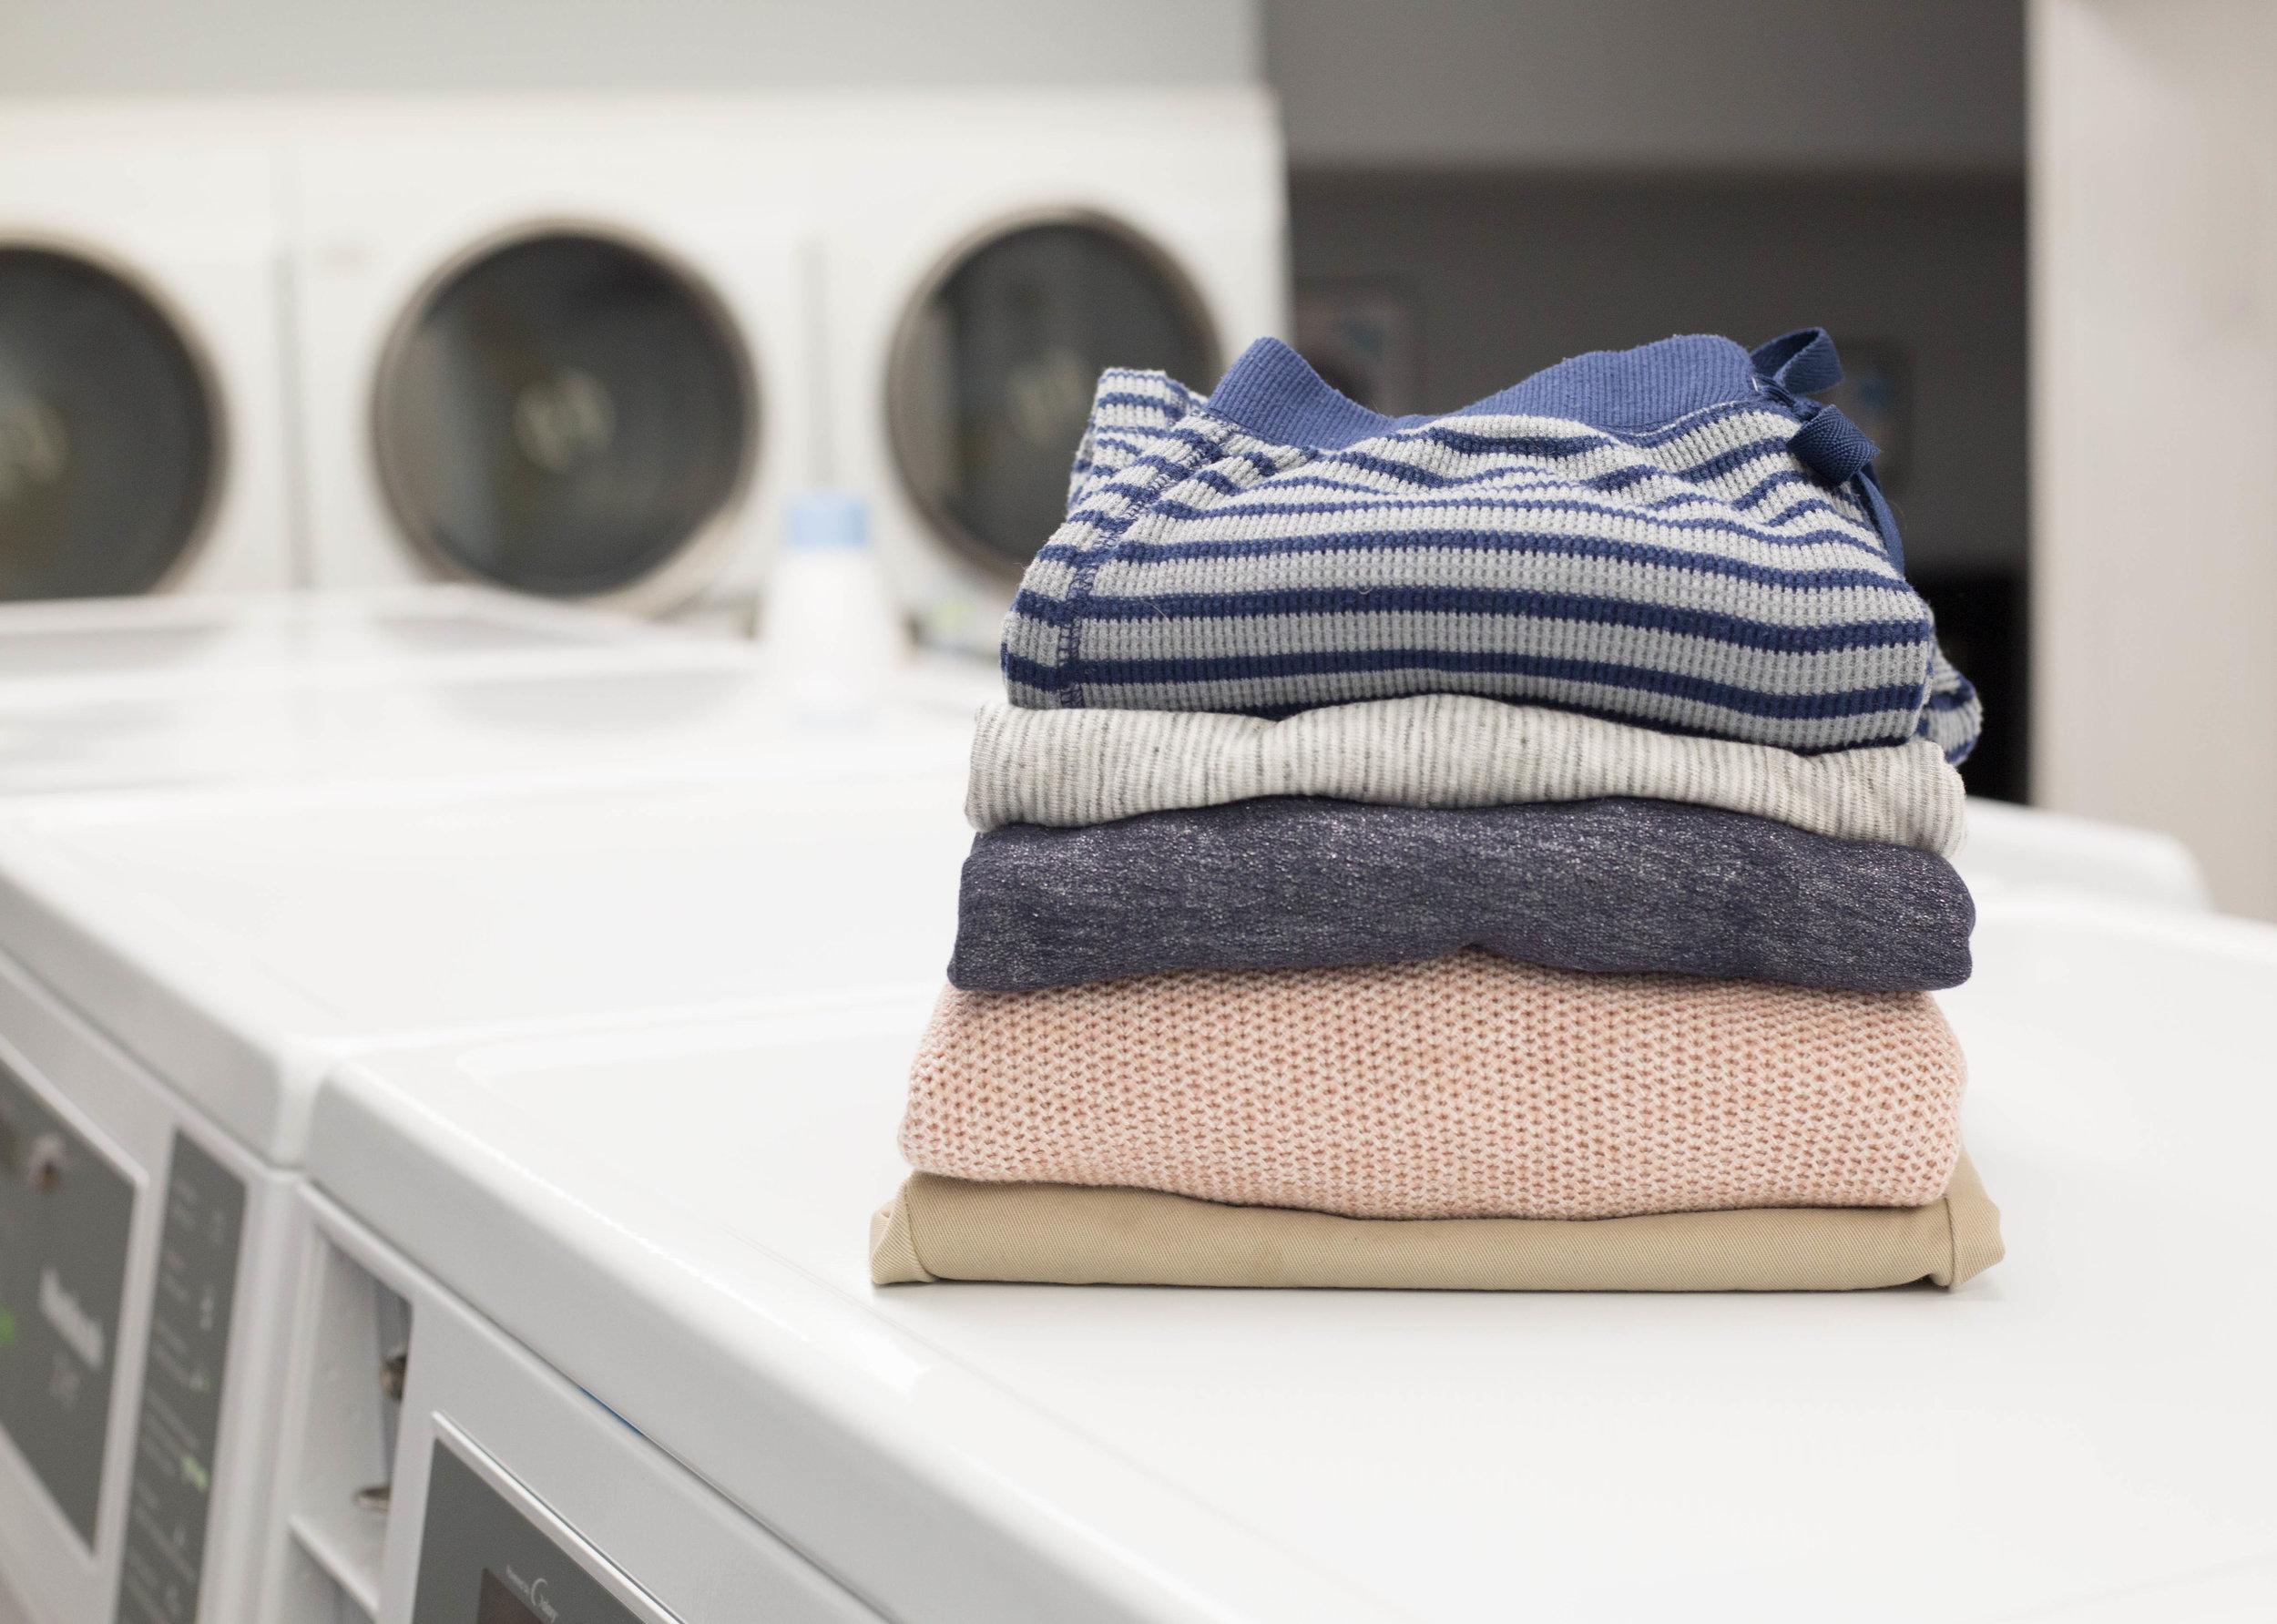 Laundromat Wash & Dry Pricing - 10lb washers . . .$3.50/wash20lb washers. . .$3.50/wash30lb washers. . .$4.50/washDryers. . . . . . . . .$.25/5 minutes